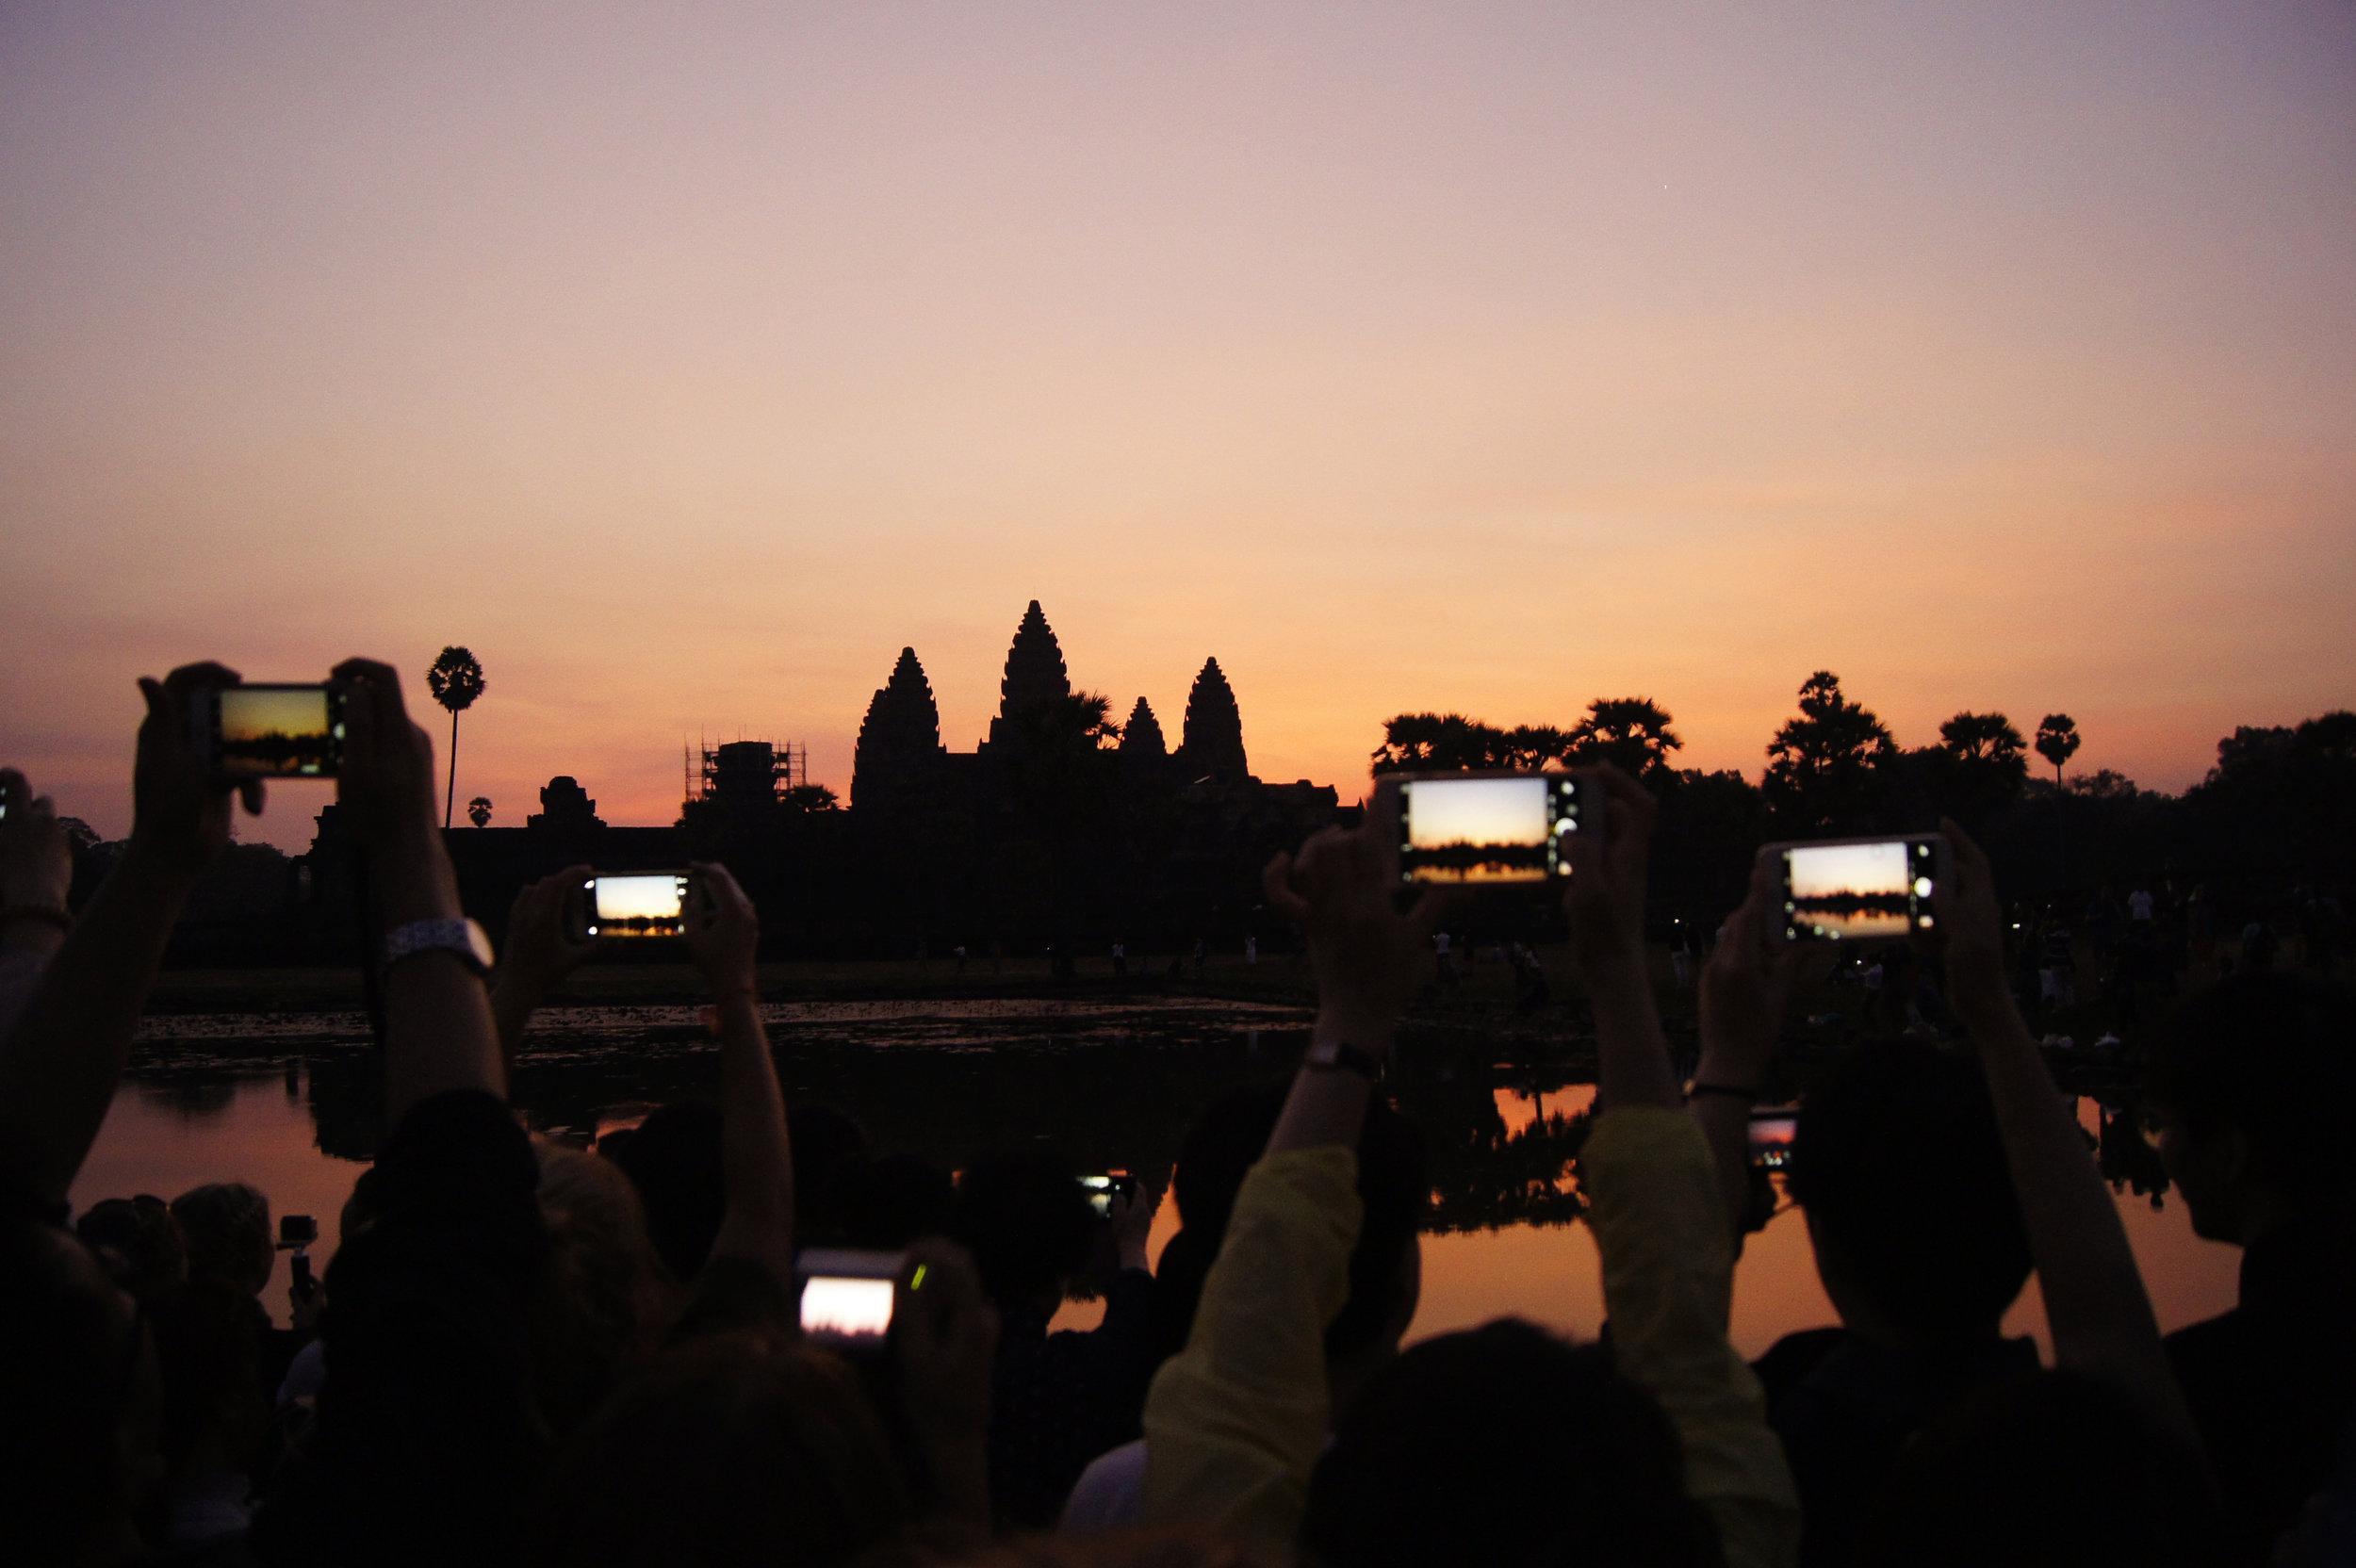 SUNRISE - ANGKOR WAT, SIEM REAP, CAMBODIA.                                                                                       PHOTOGRAPHY: @HILARYAGUILAR